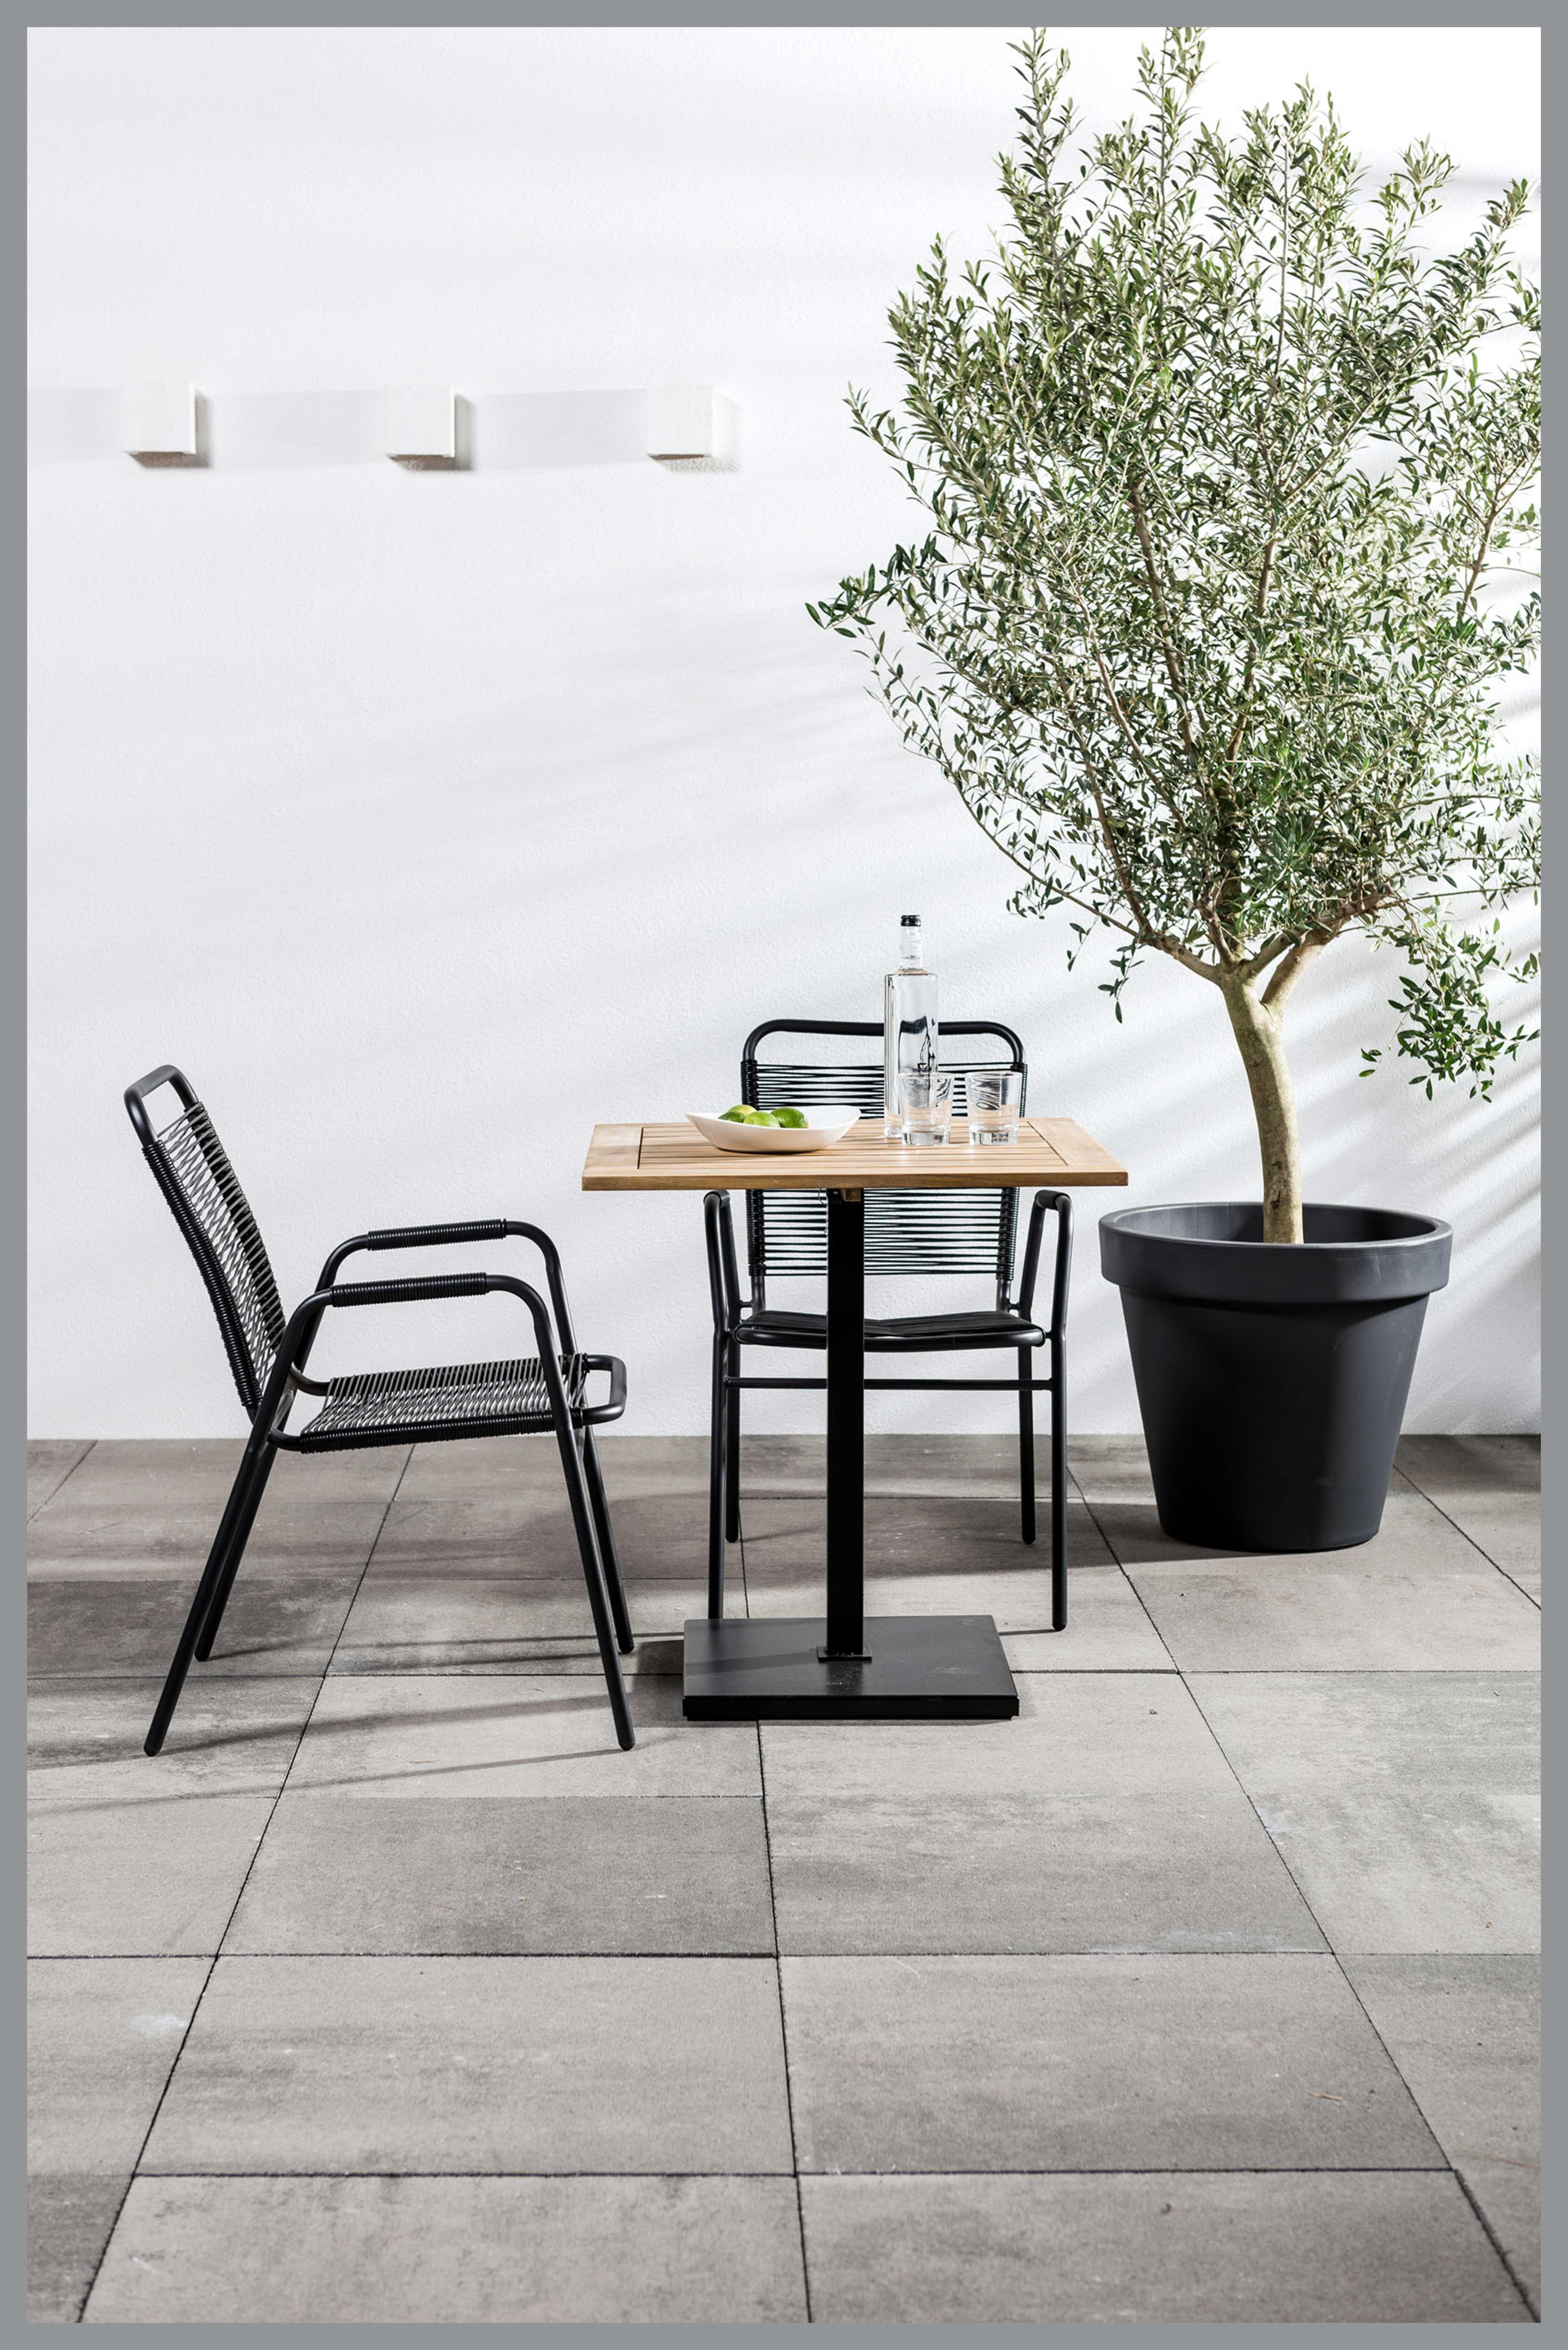 Karwei - Design Tuin